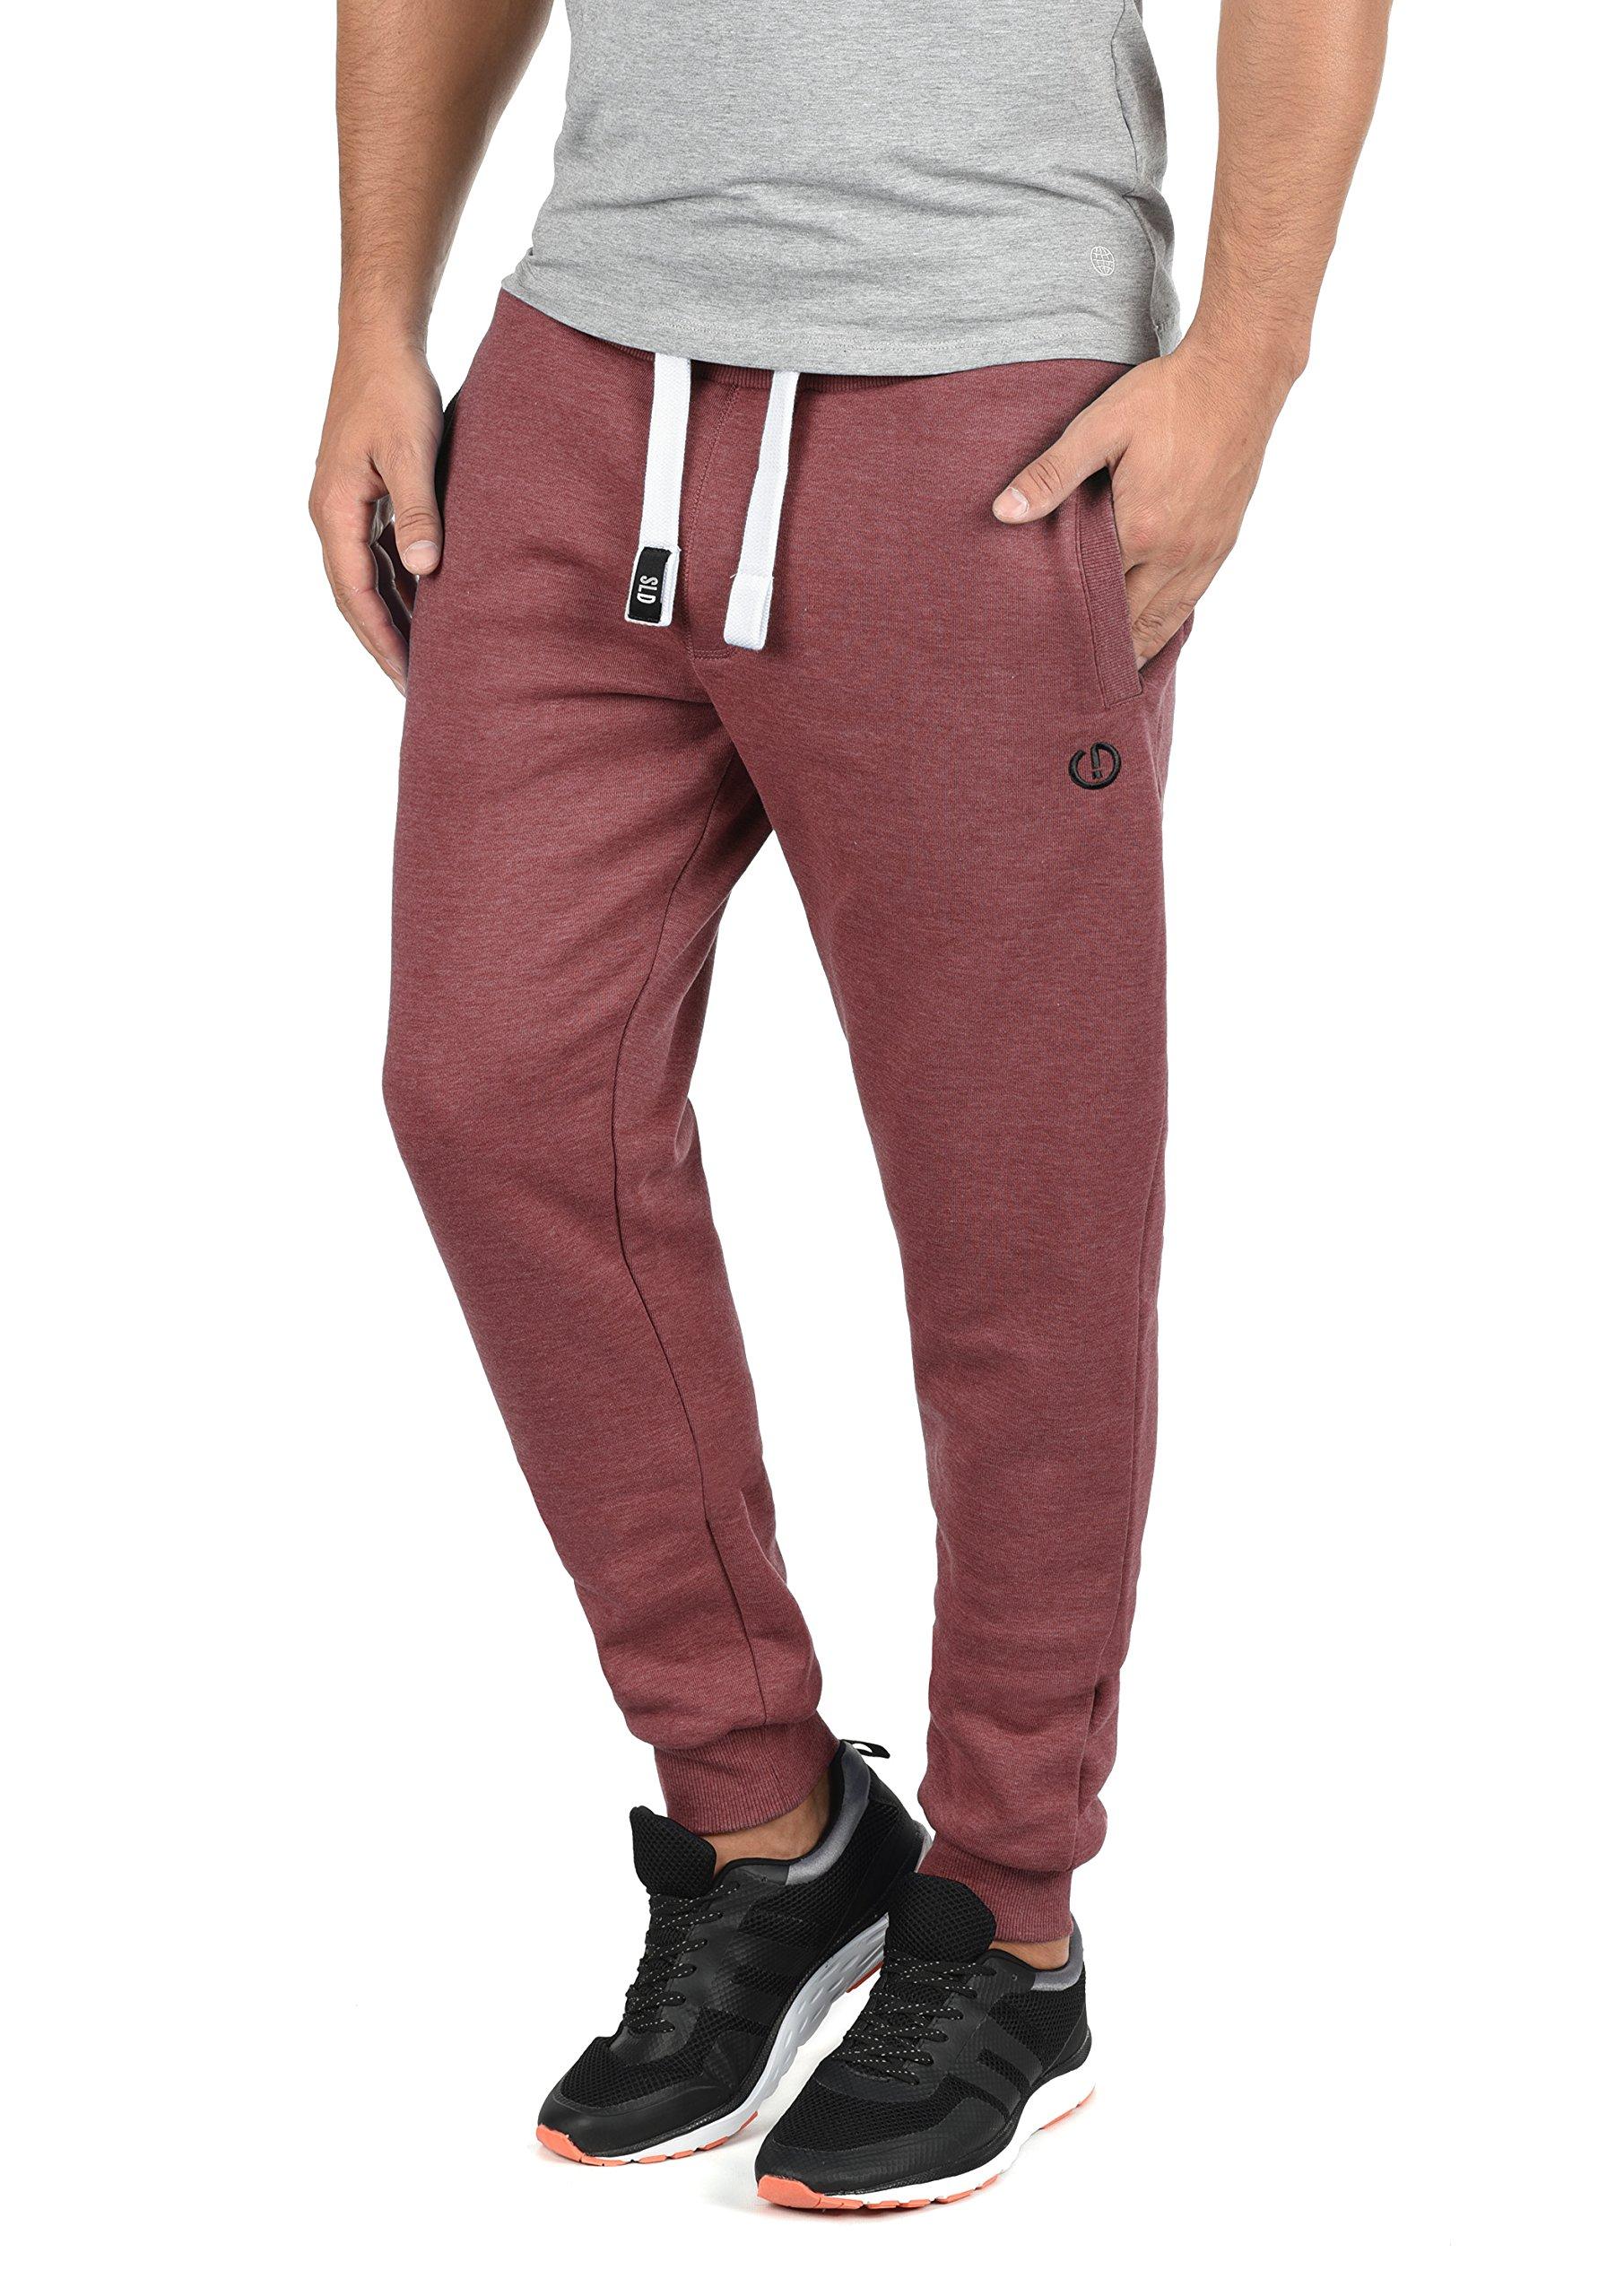 93a8cfdf2da6d0 Solid BennPant Herren Sweatpants Jogginghose Sporthose mit  Fleece-Innenseite und Kordel Regular Fit product !